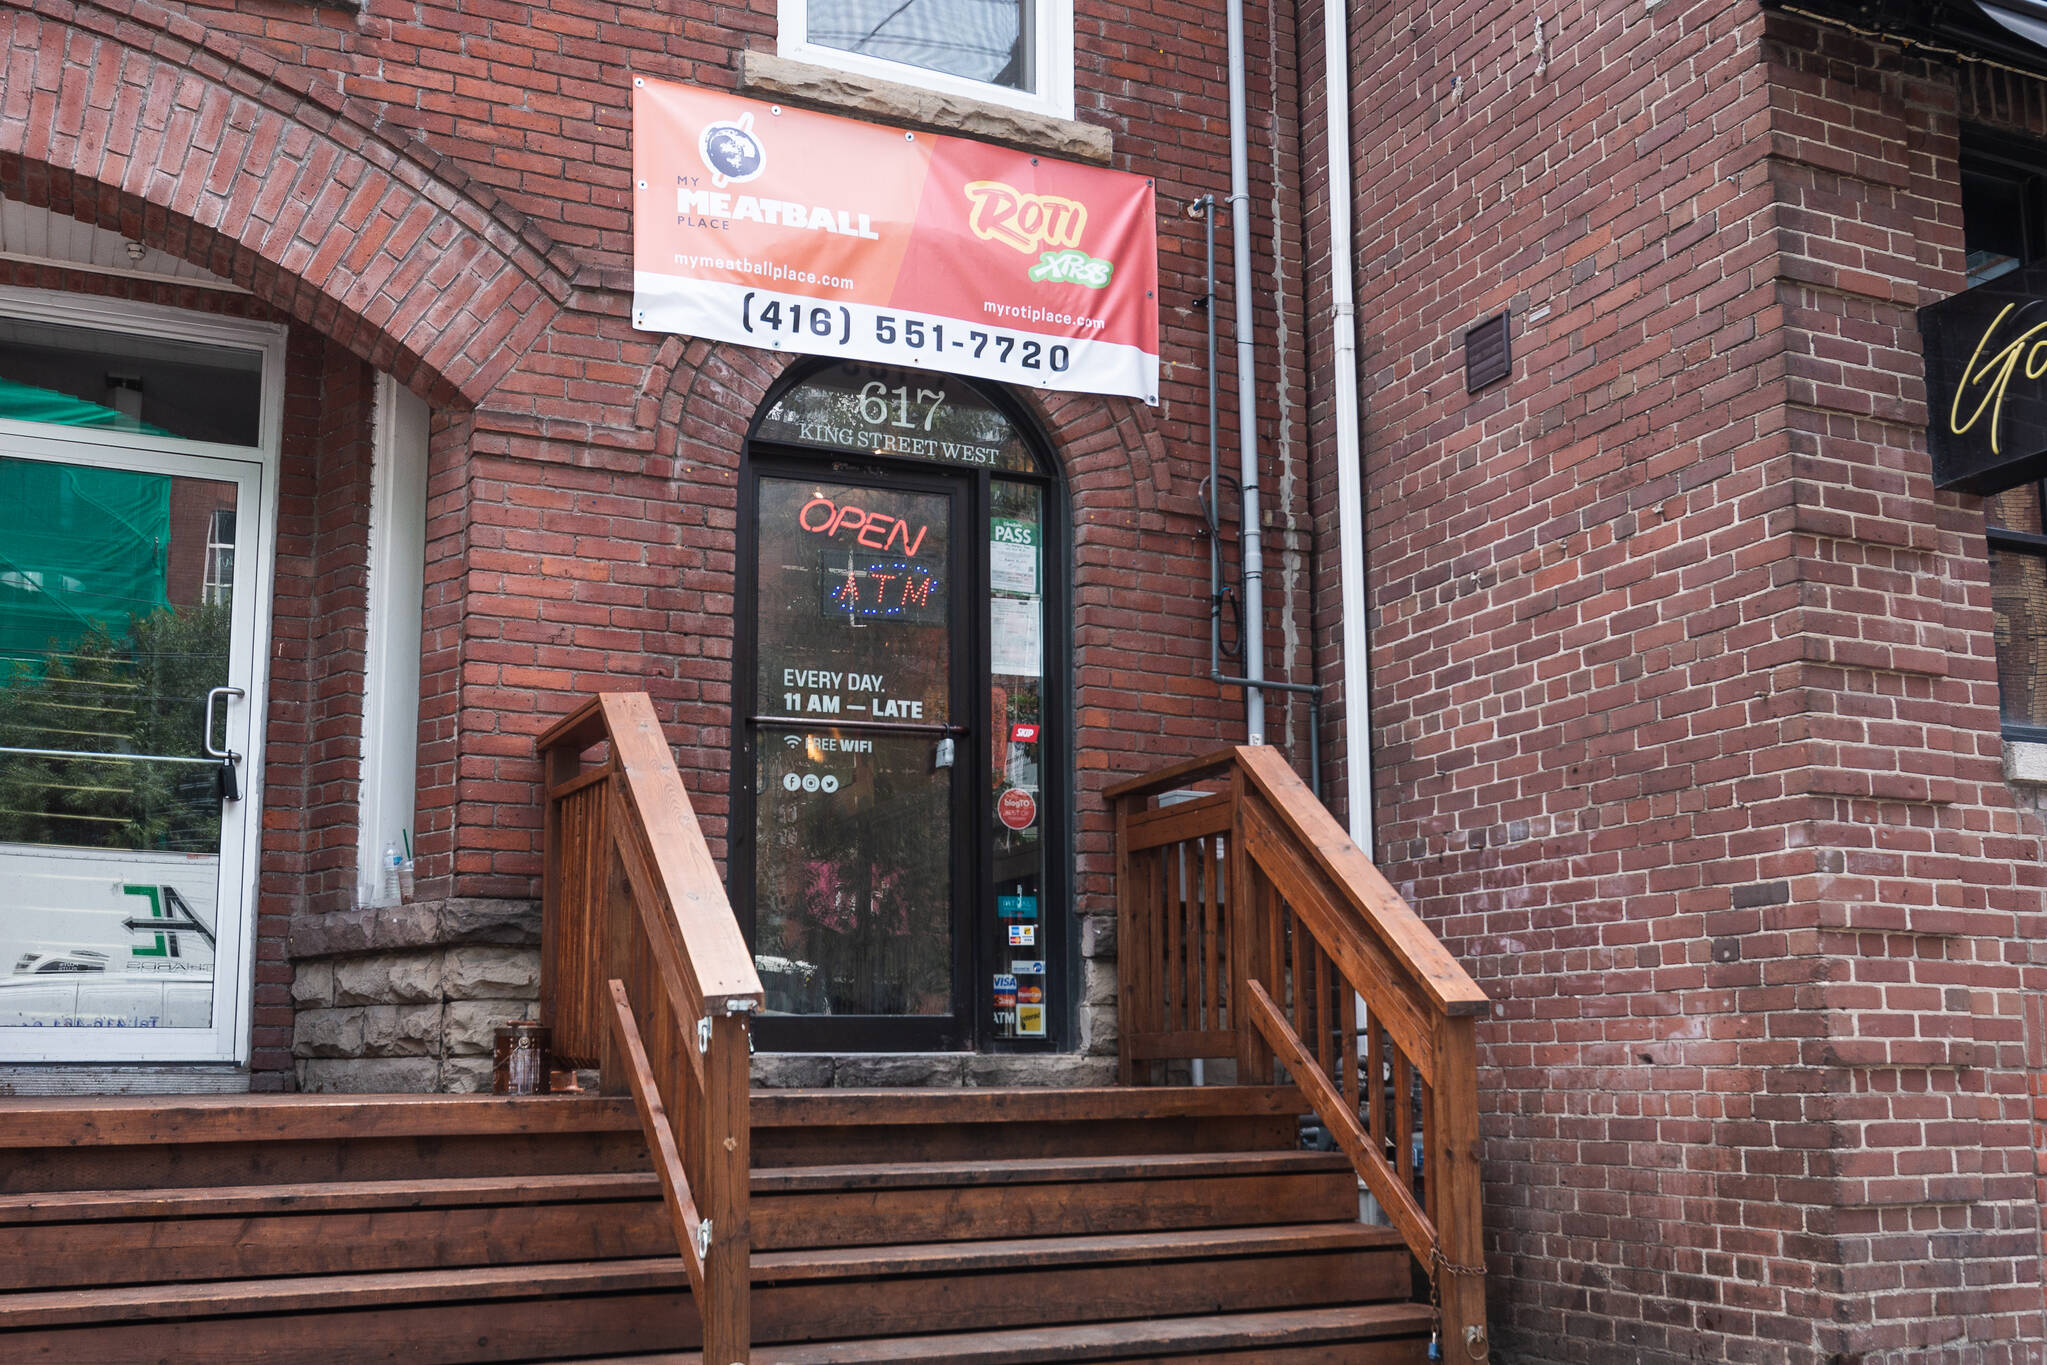 My Meatball Place Toronto